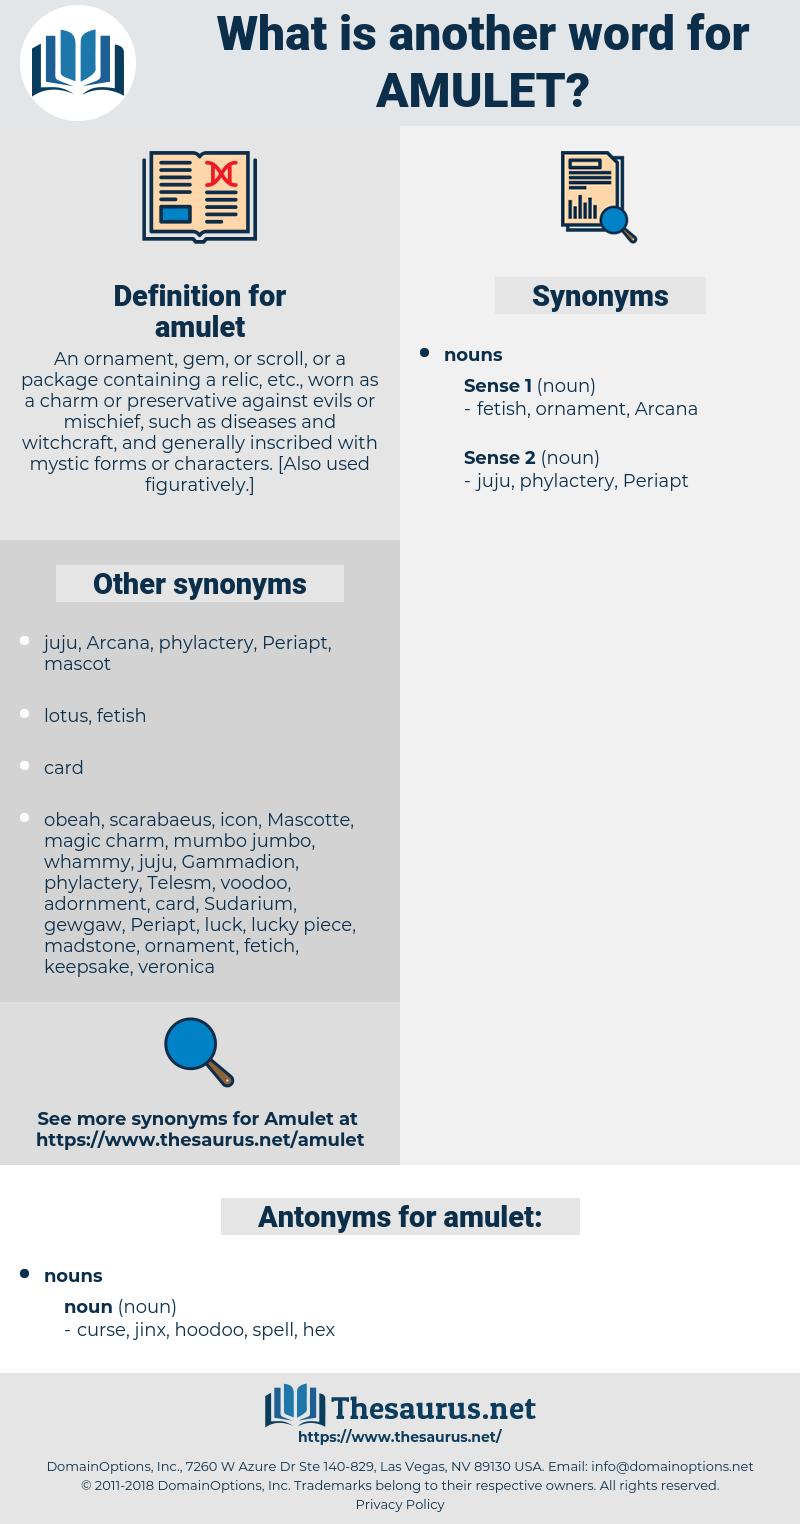 amulet, synonym amulet, another word for amulet, words like amulet, thesaurus amulet